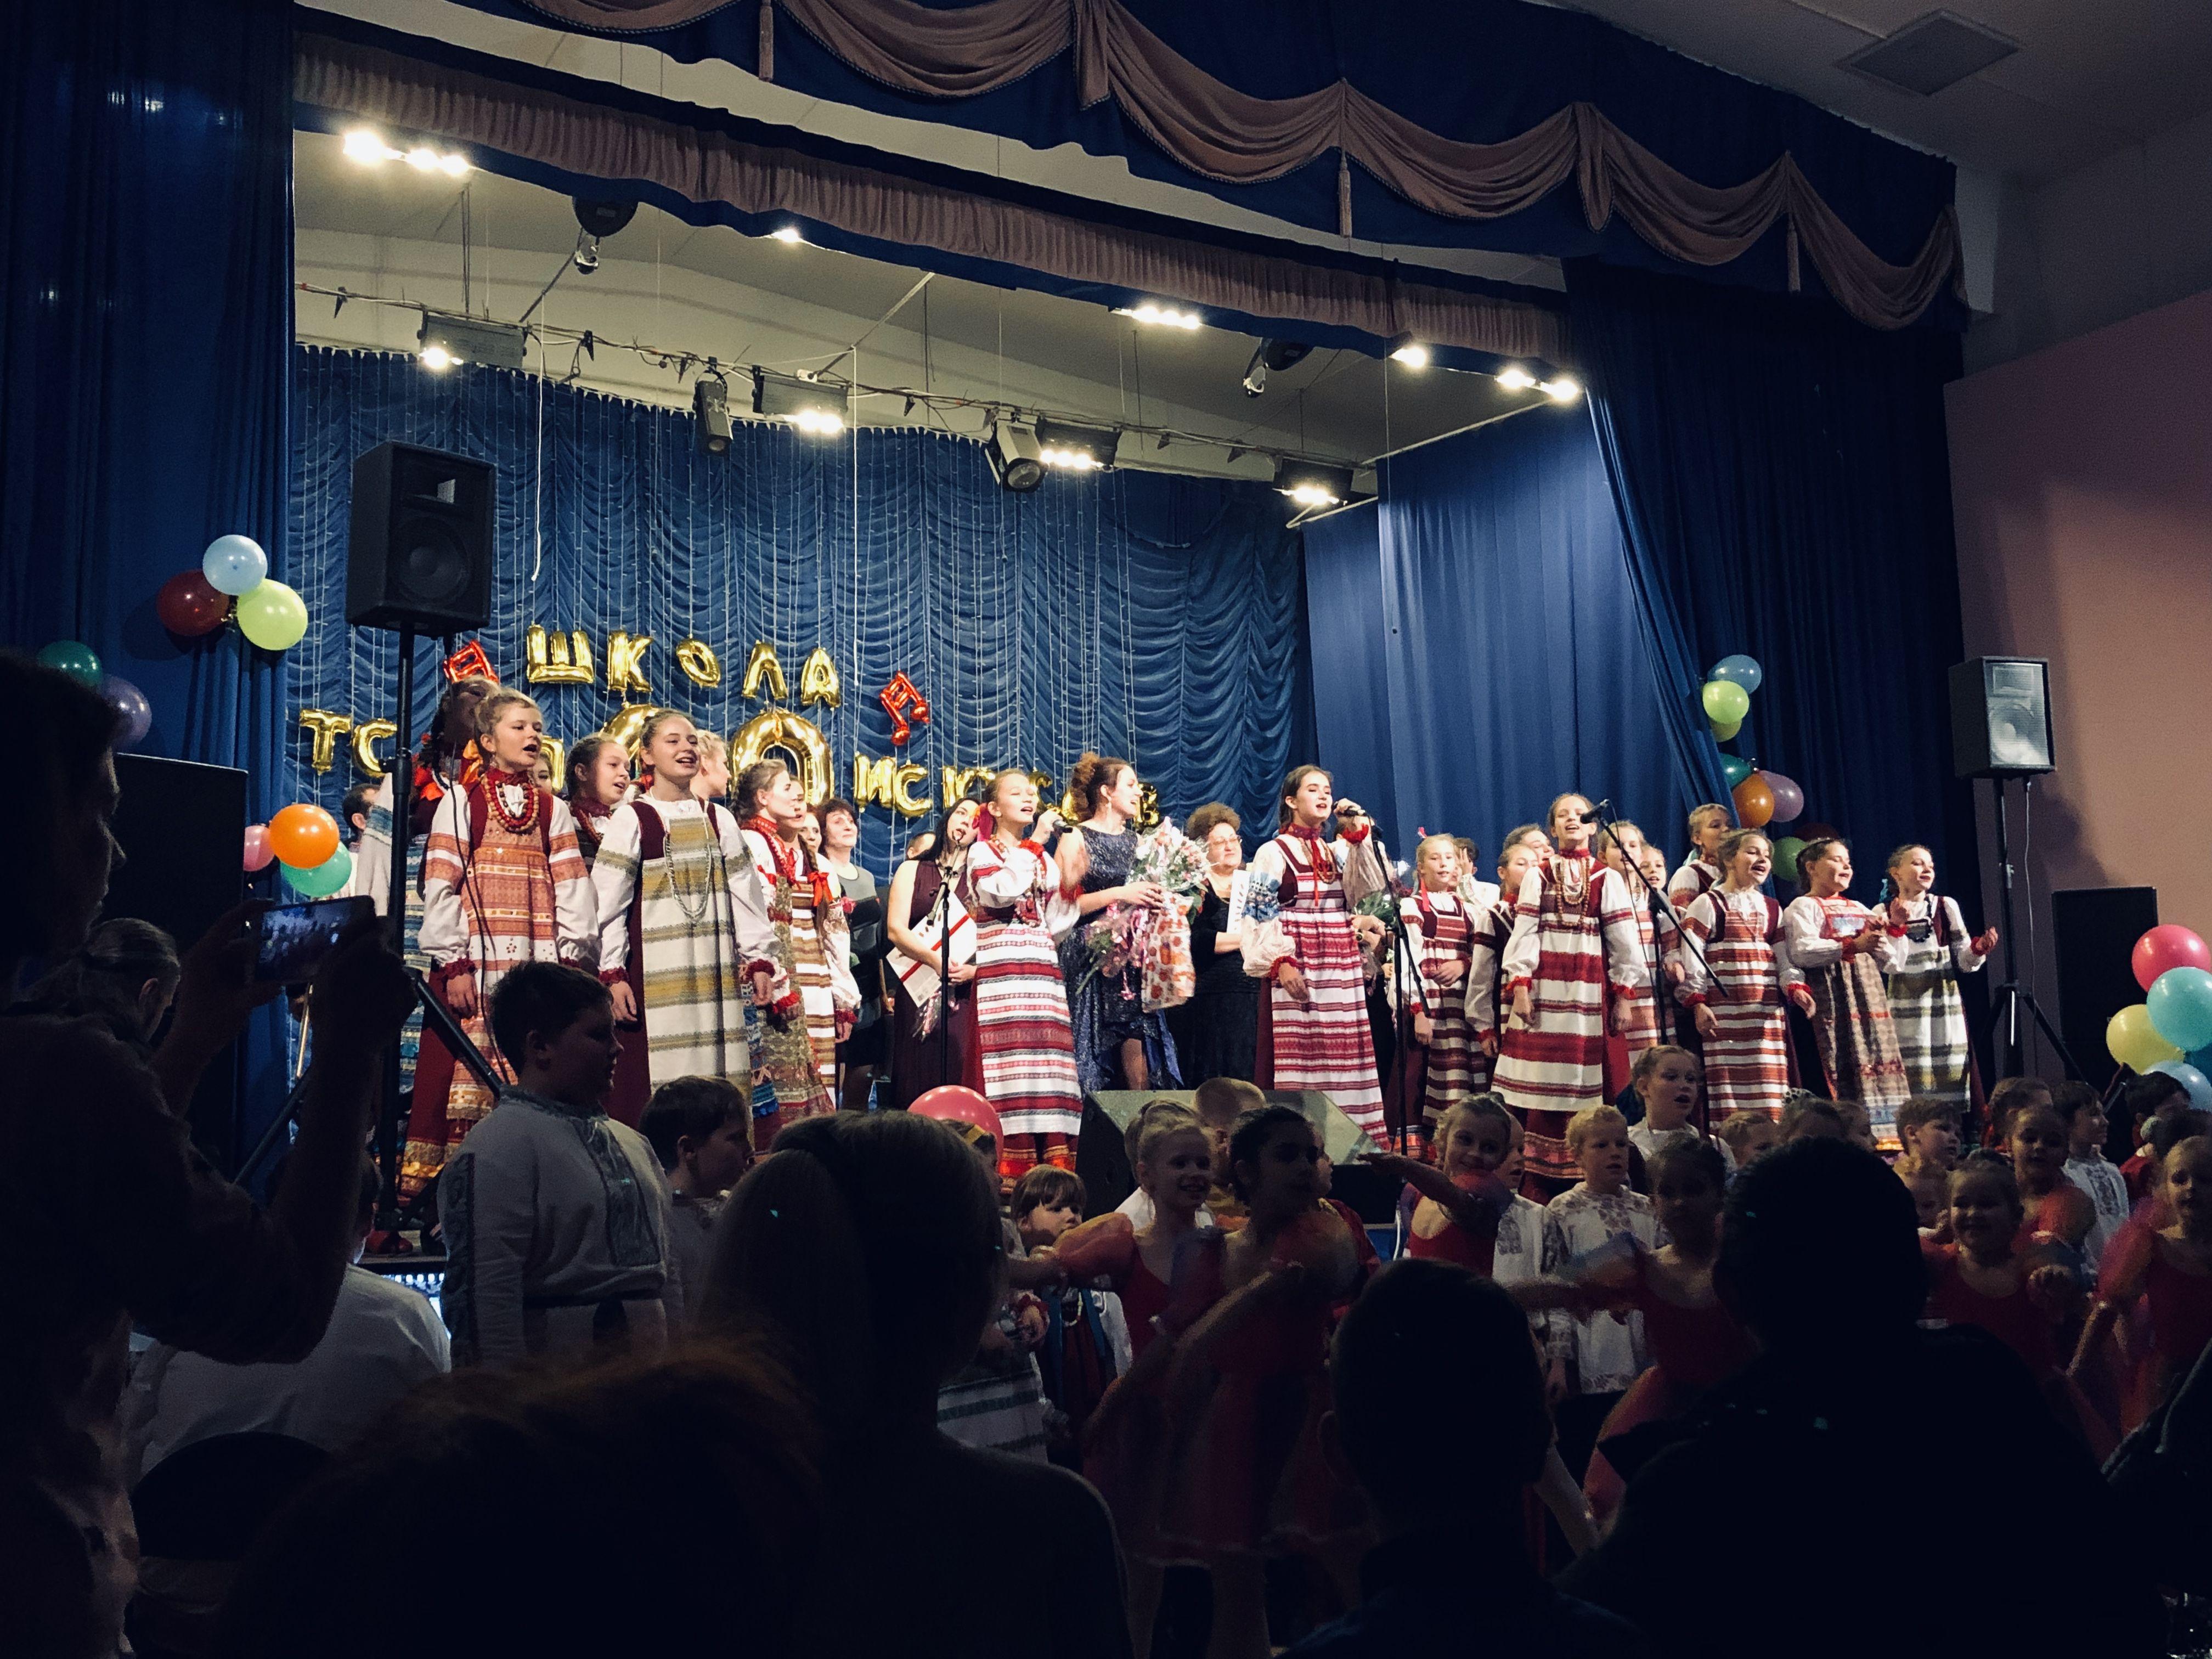 40-летие ДШИ в Михайлово-Ярцевском. Фото: Нелли Казарян